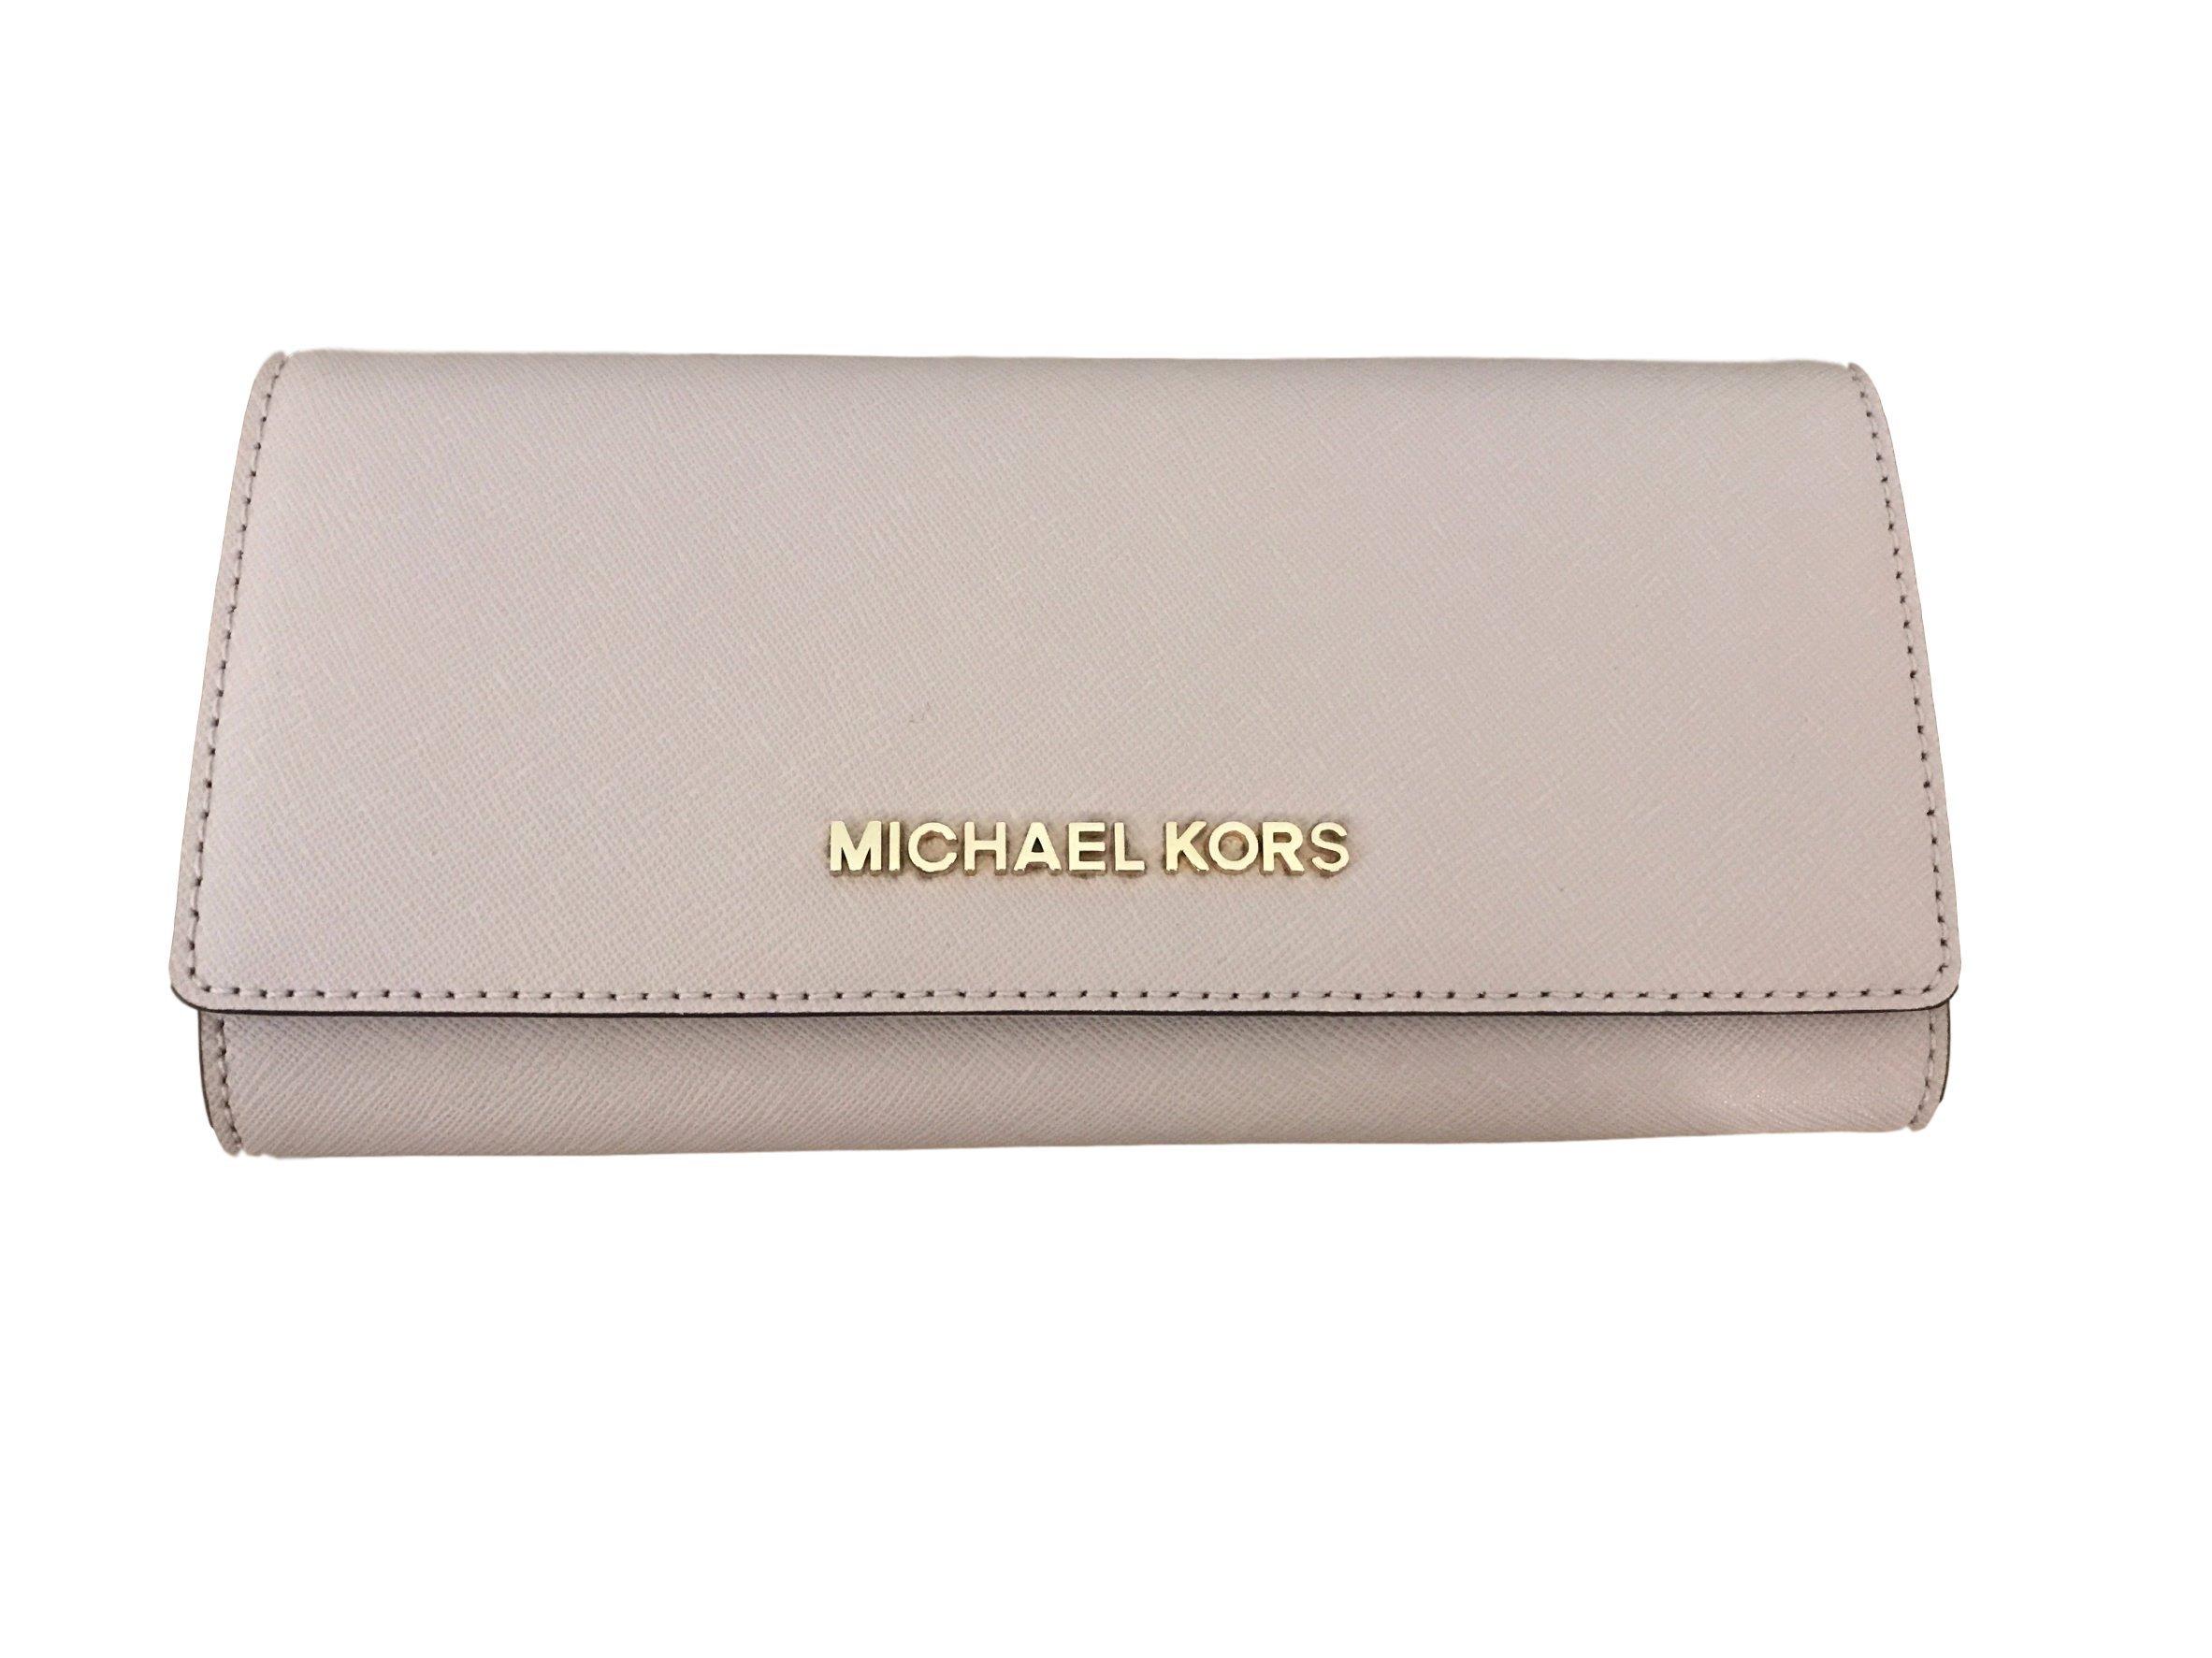 Michael Kors Jet Set travel Carryall Leather Clutch wallet in Ballet Pink